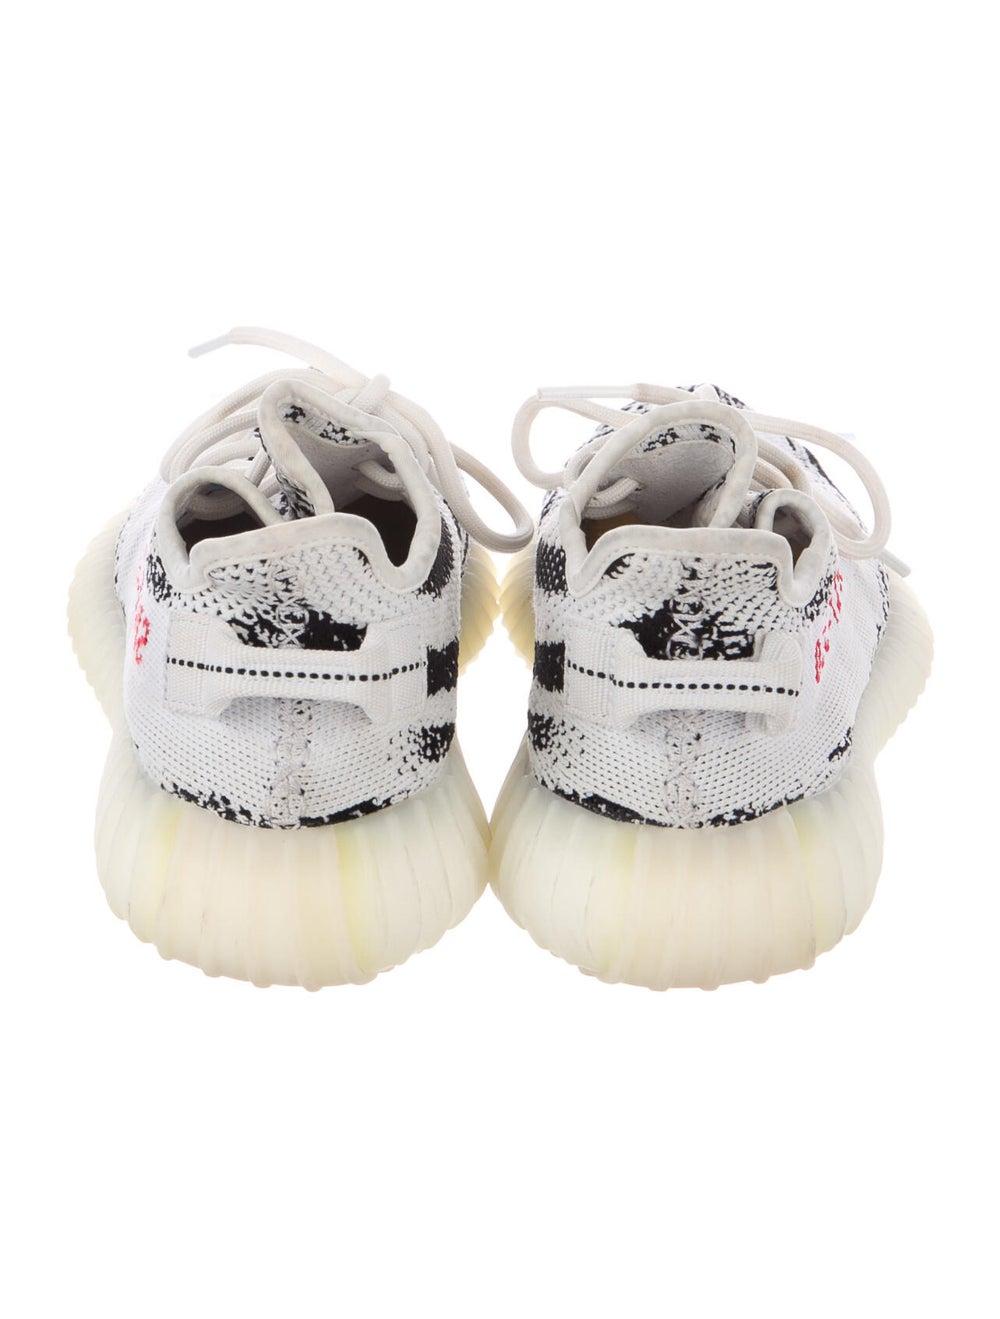 Yeezy x adidas Boost 350 V2 Zebra Sneakers Sneake… - image 4